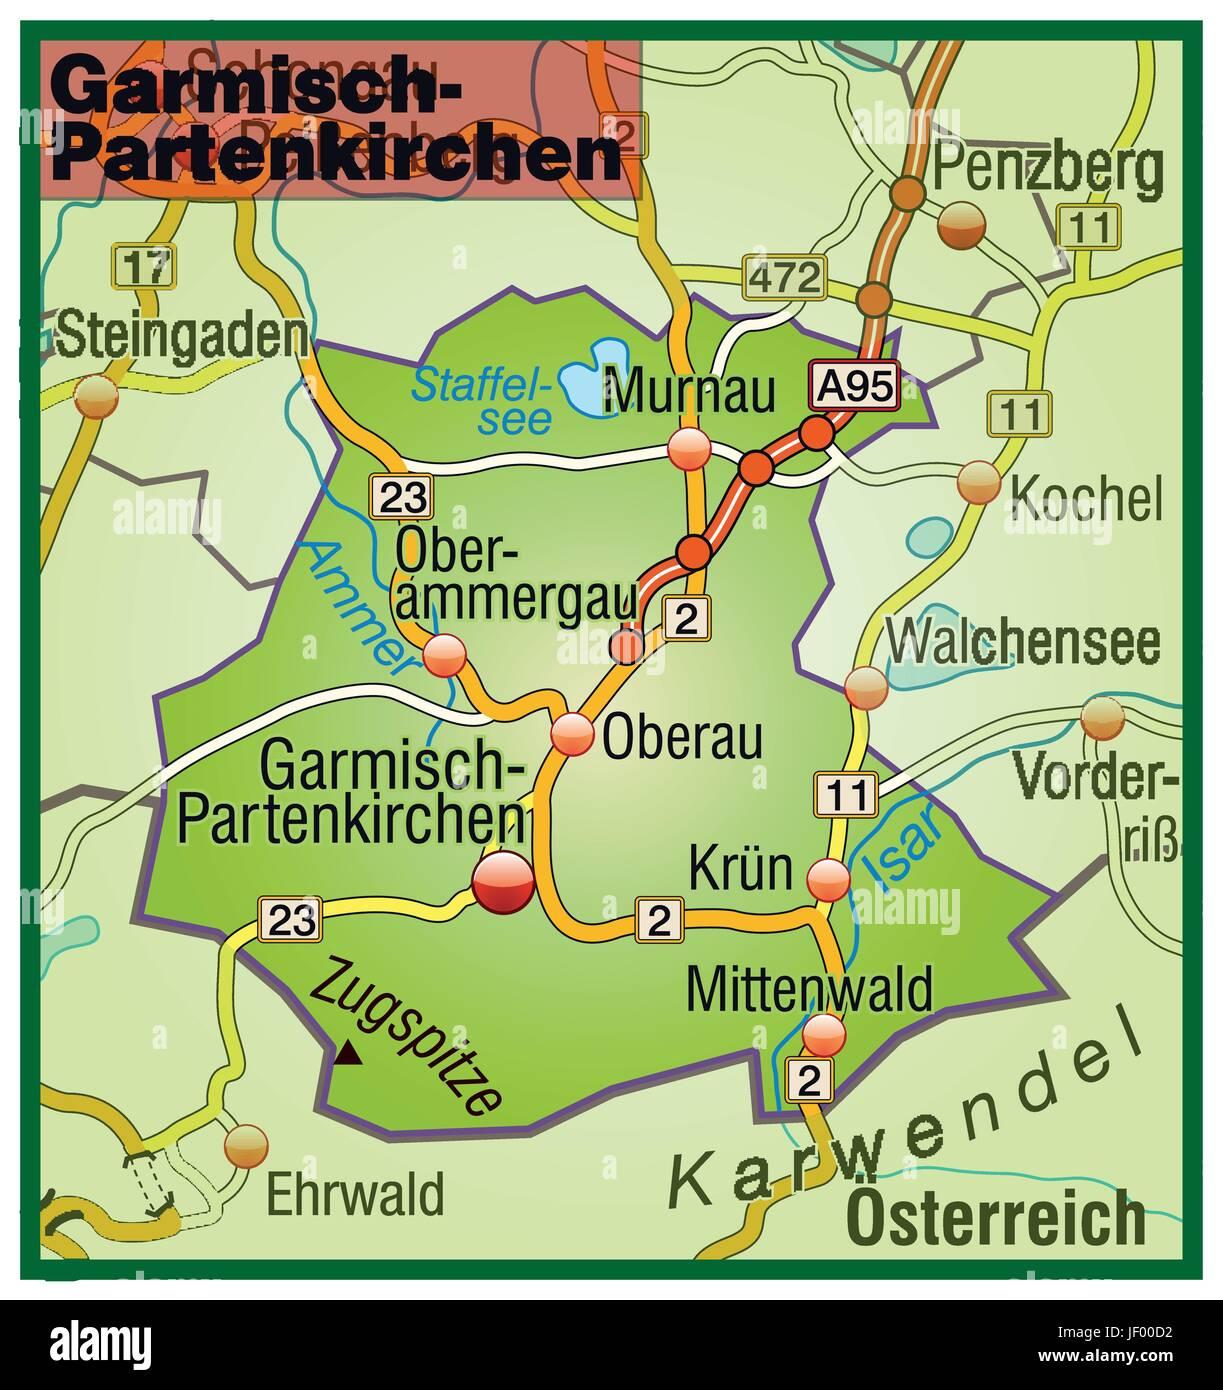 map of garmisch-partenkirchen with transport network Stock ... Garmisch Partenkirchen Map on babenhausen map, cortina d'ampezzo map, magdeburg map, berchtesgaden map, landstuhl map, germany map, weimar map, freiburg map, albertville map, rothenburg ob der tauber map, karlsruhe map, europe map, bonn map, garmisch trail map, saxony map, koblenz map, dortmund map, oberammergau map, oslo map, duisburg map,